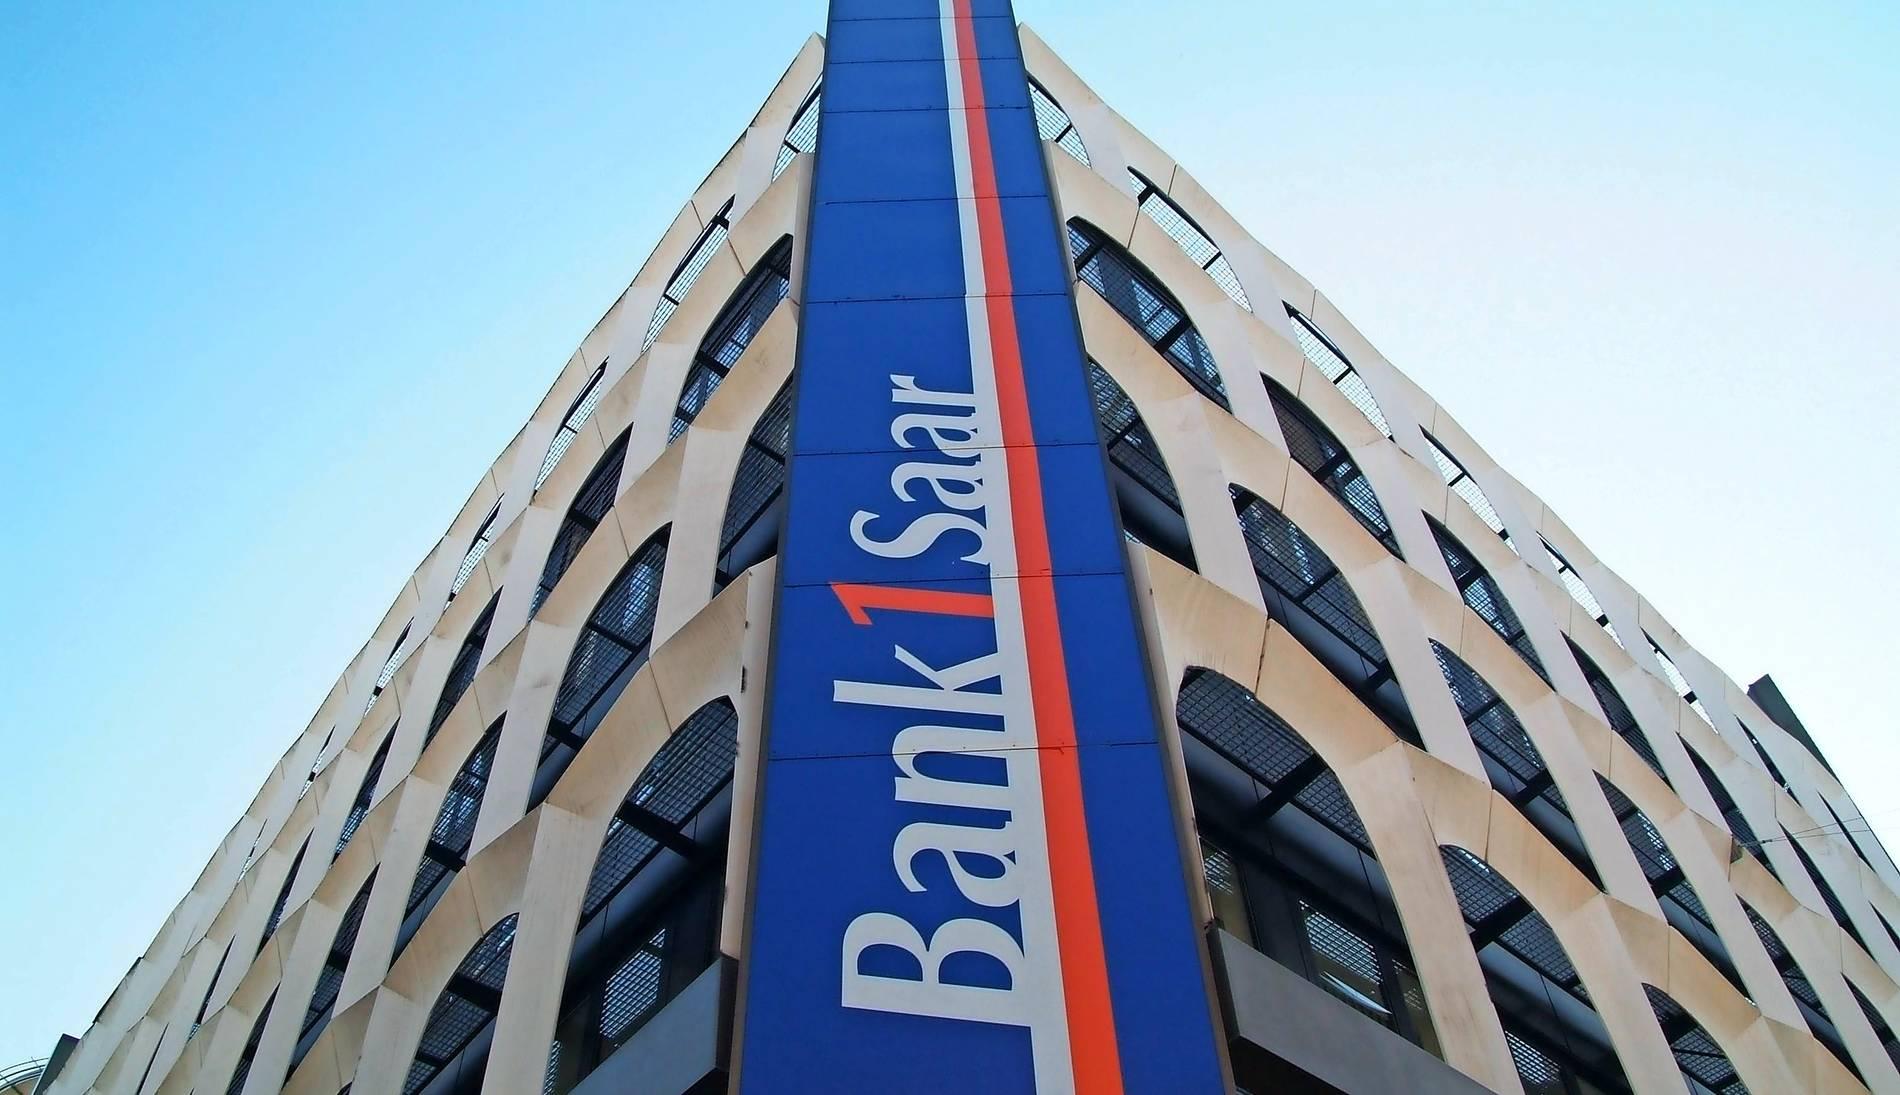 Saar 1 Bank